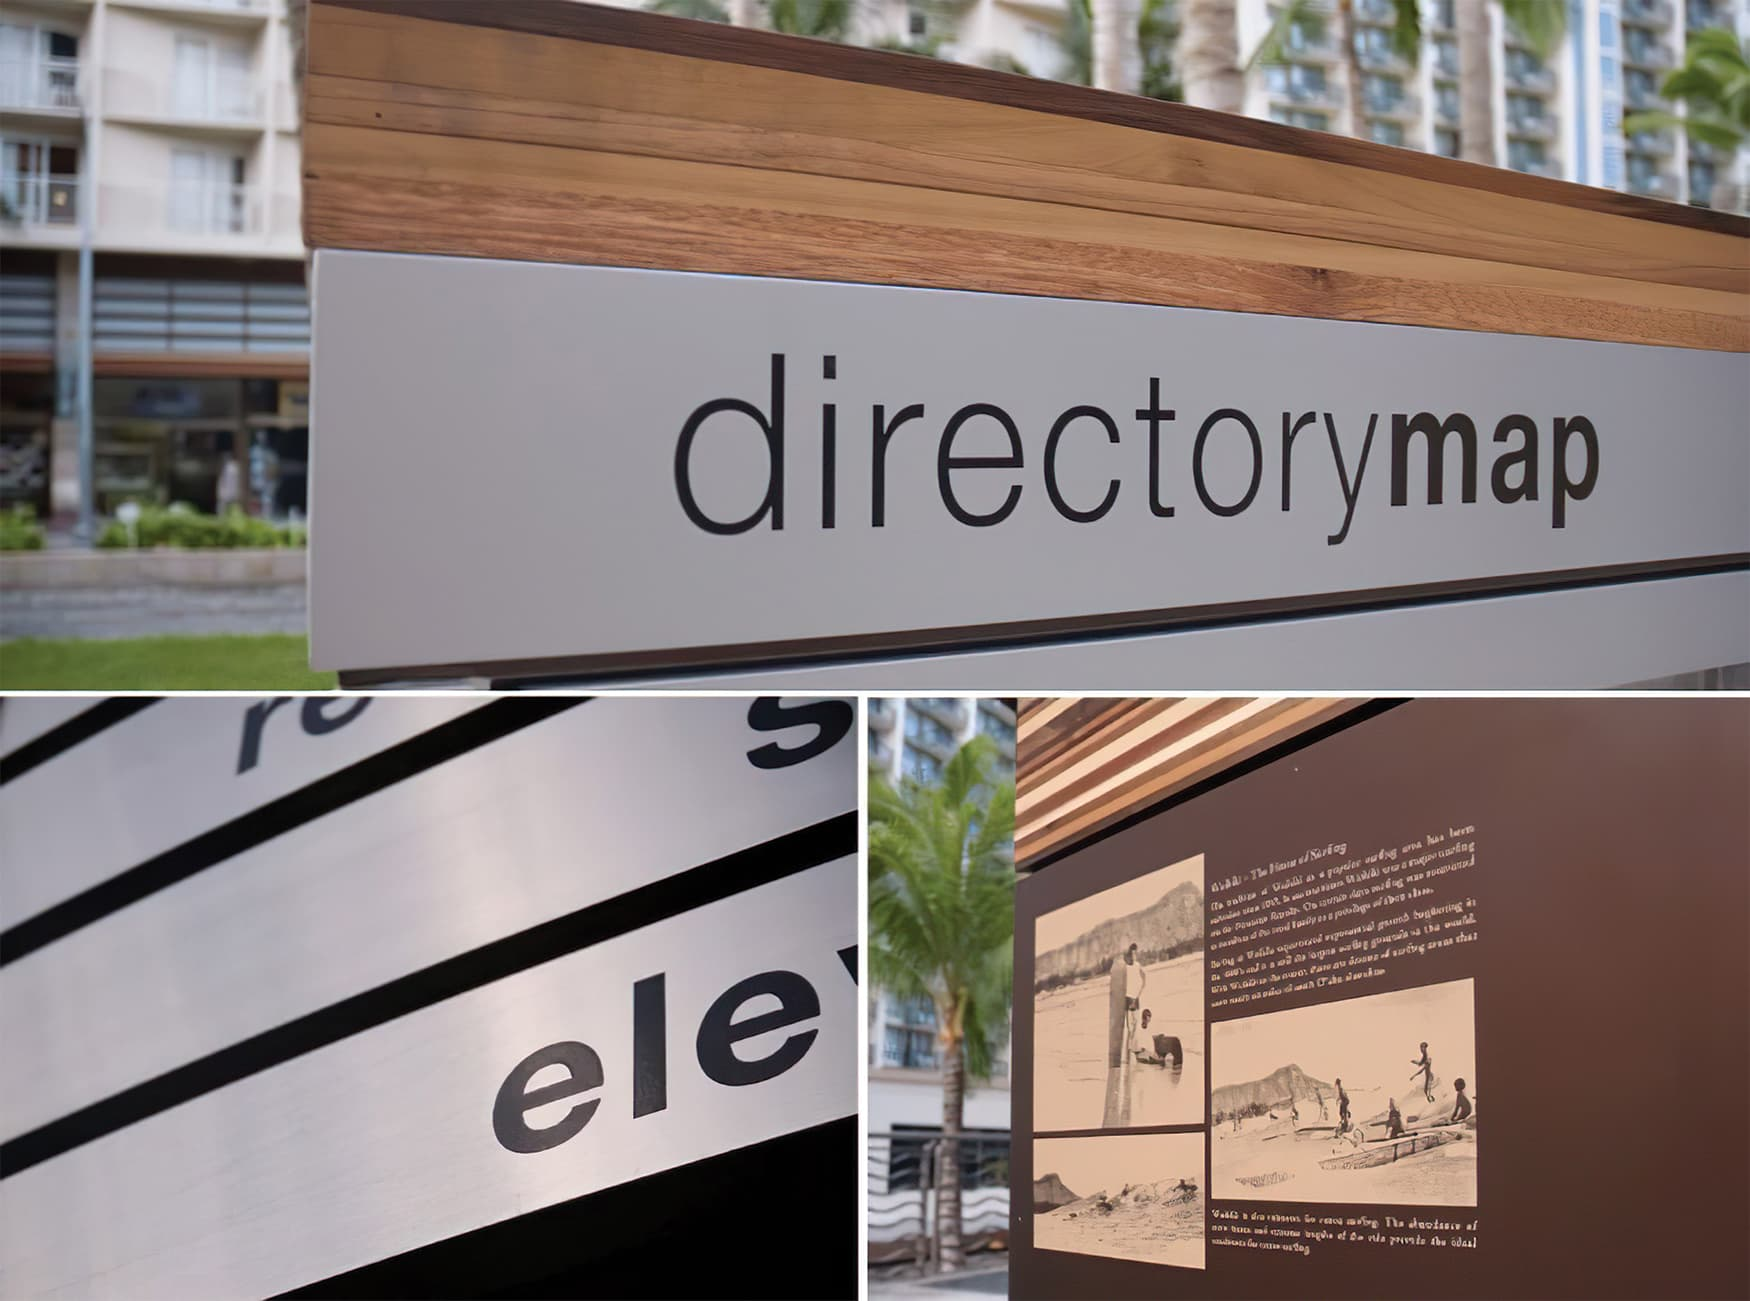 Waikiki Beach Walk. Public Art and Mural Design. Environmental Graphic Design. Directory Wayfinding Design.